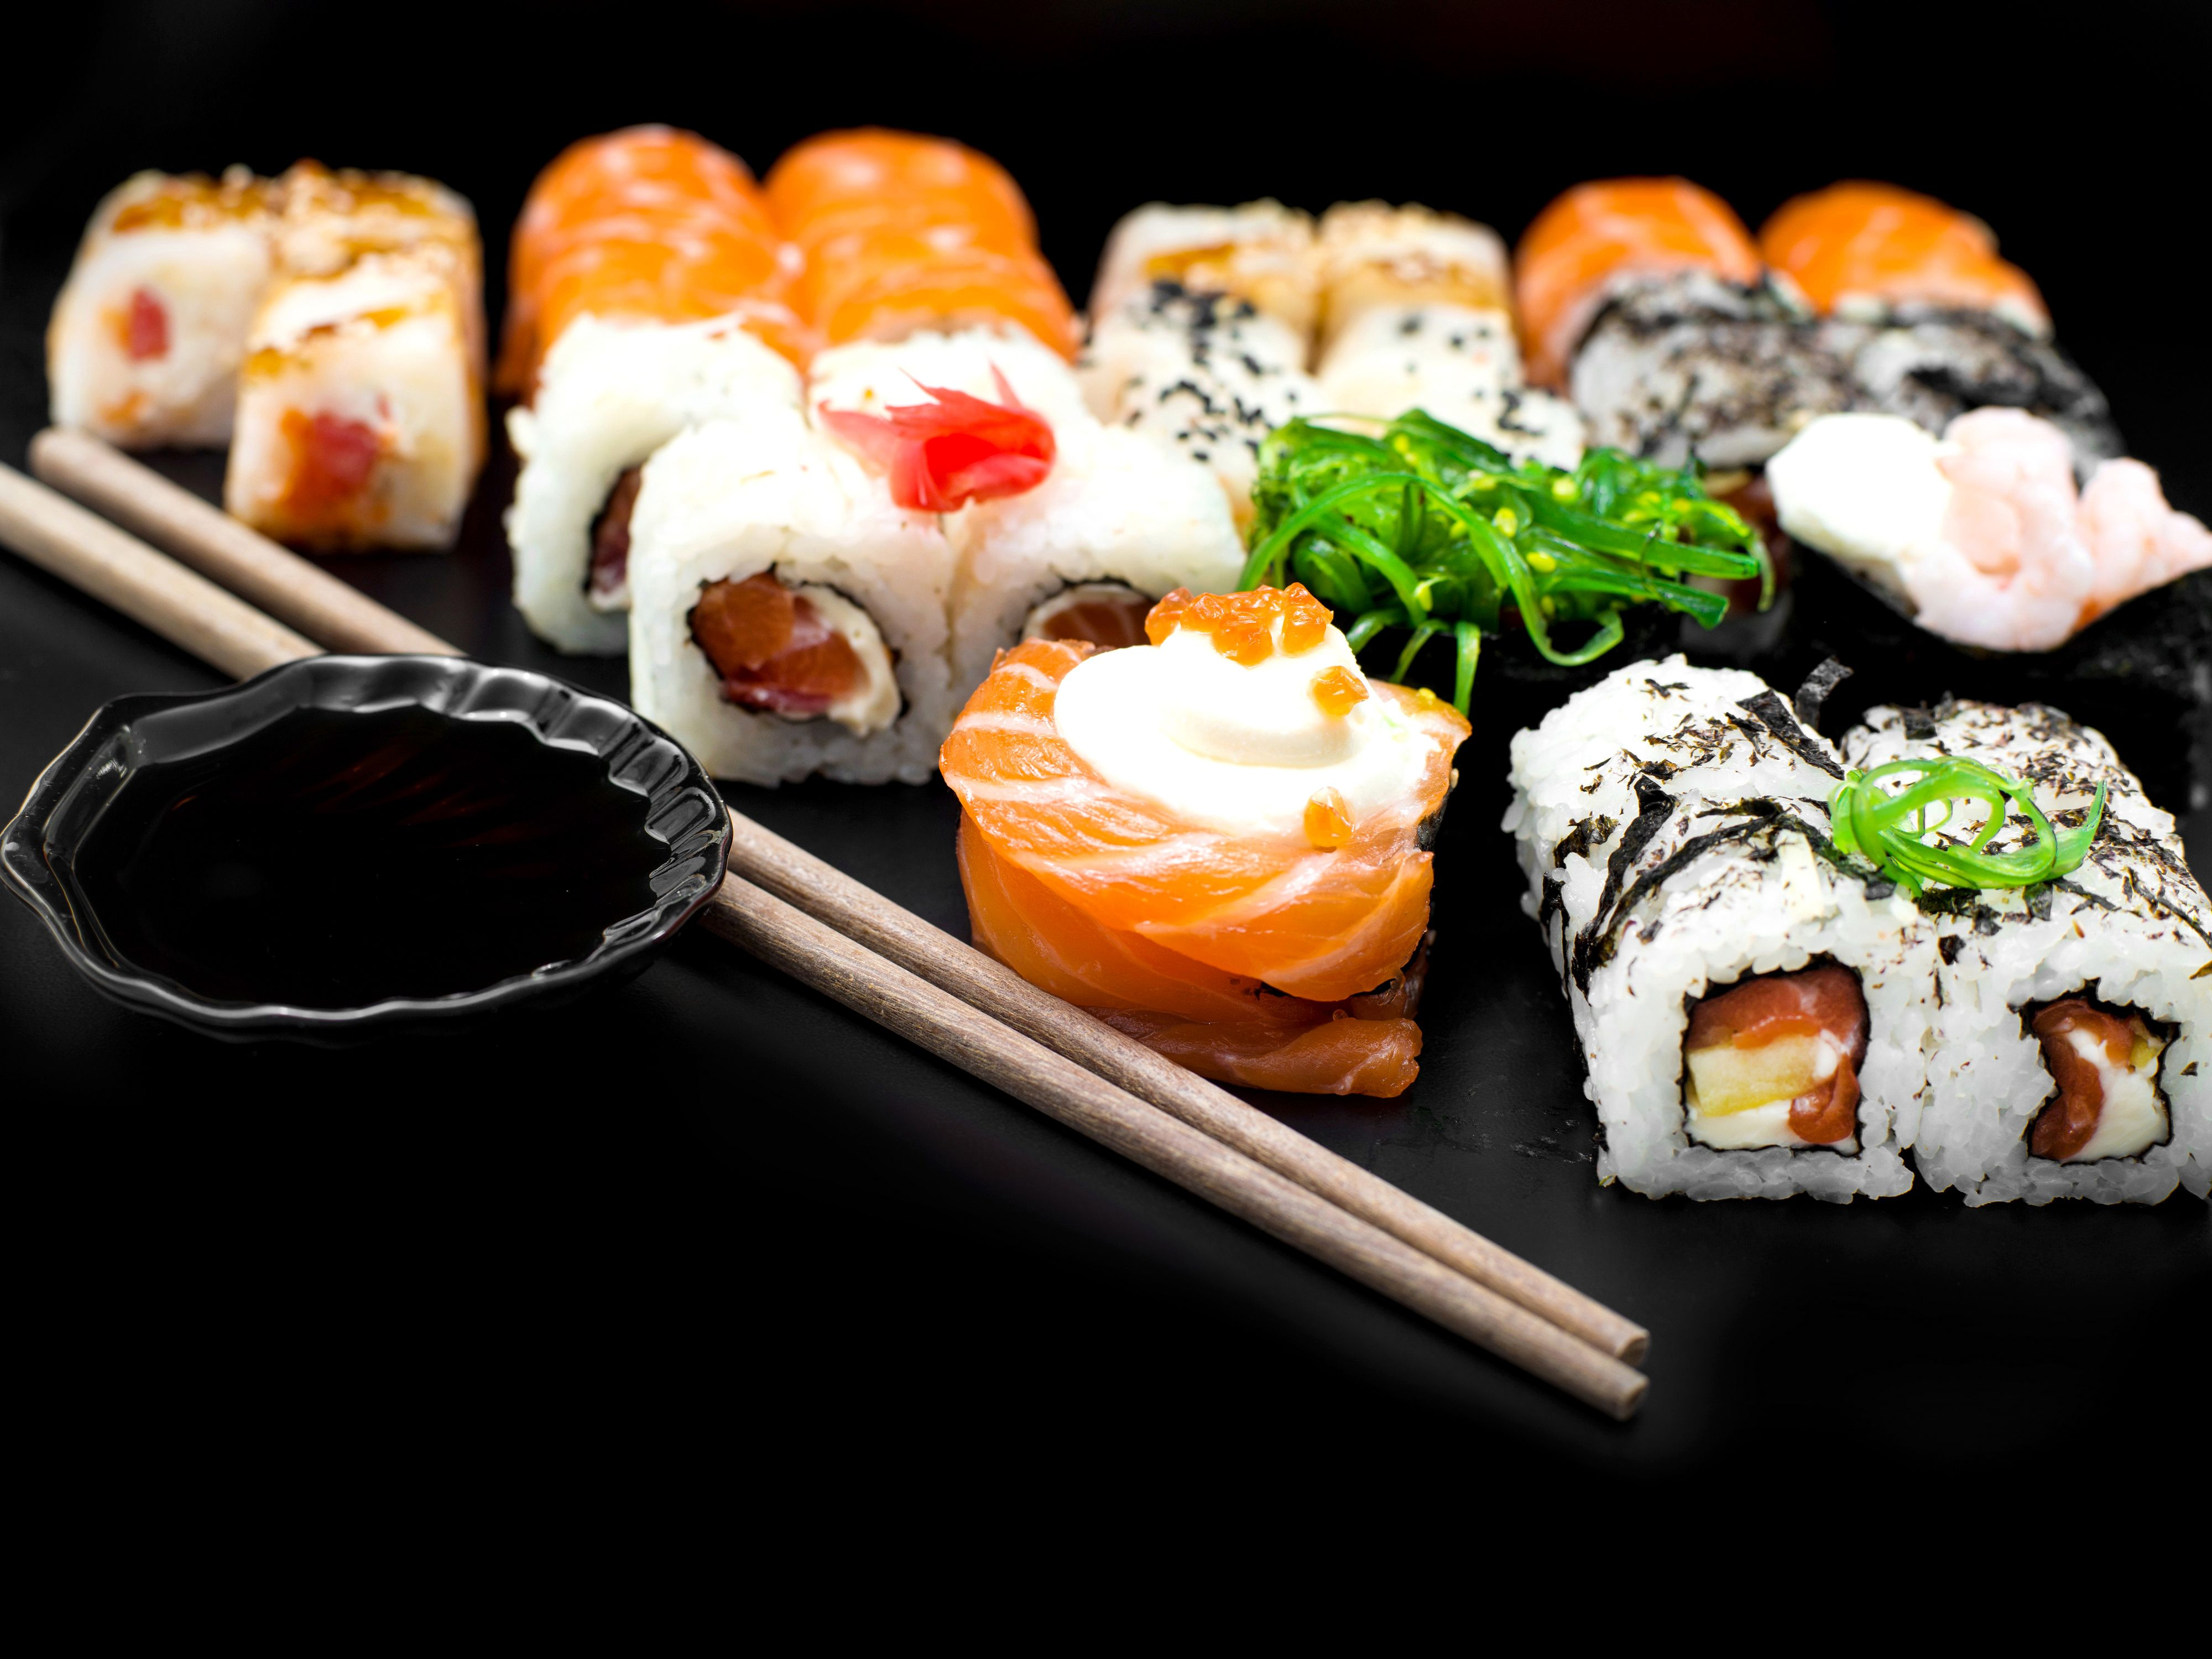 Sushi Wallpapers   Top Sushi Backgrounds   WallpaperAccess 4000x3000